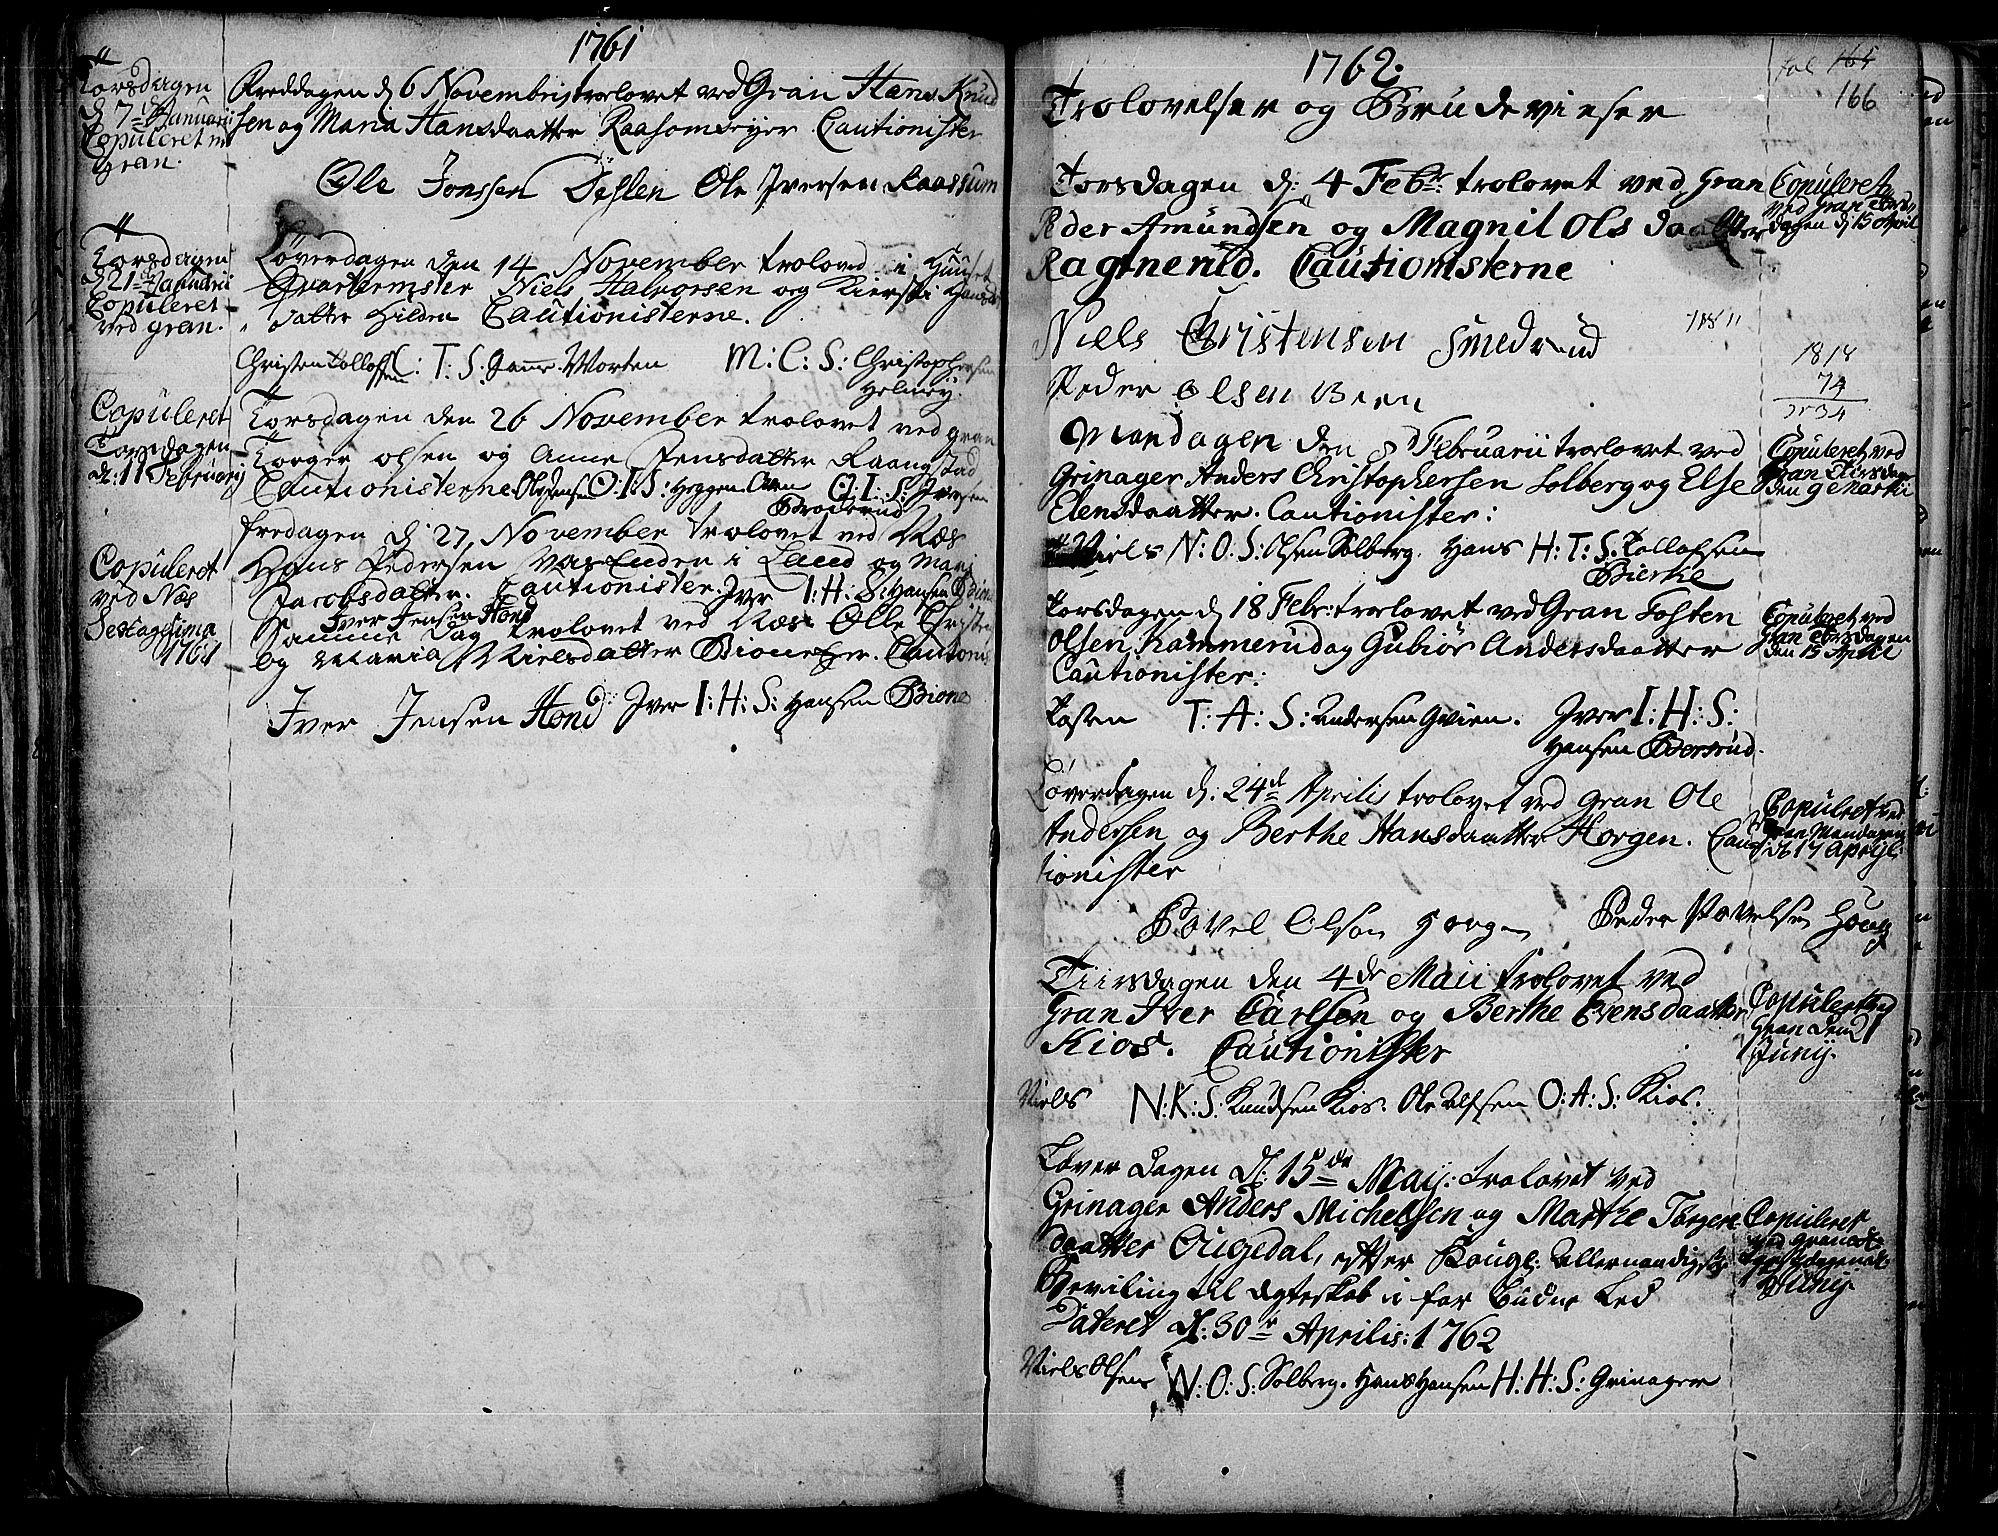 SAH, Gran prestekontor, Ministerialbok nr. 4, 1759-1775, s. 166